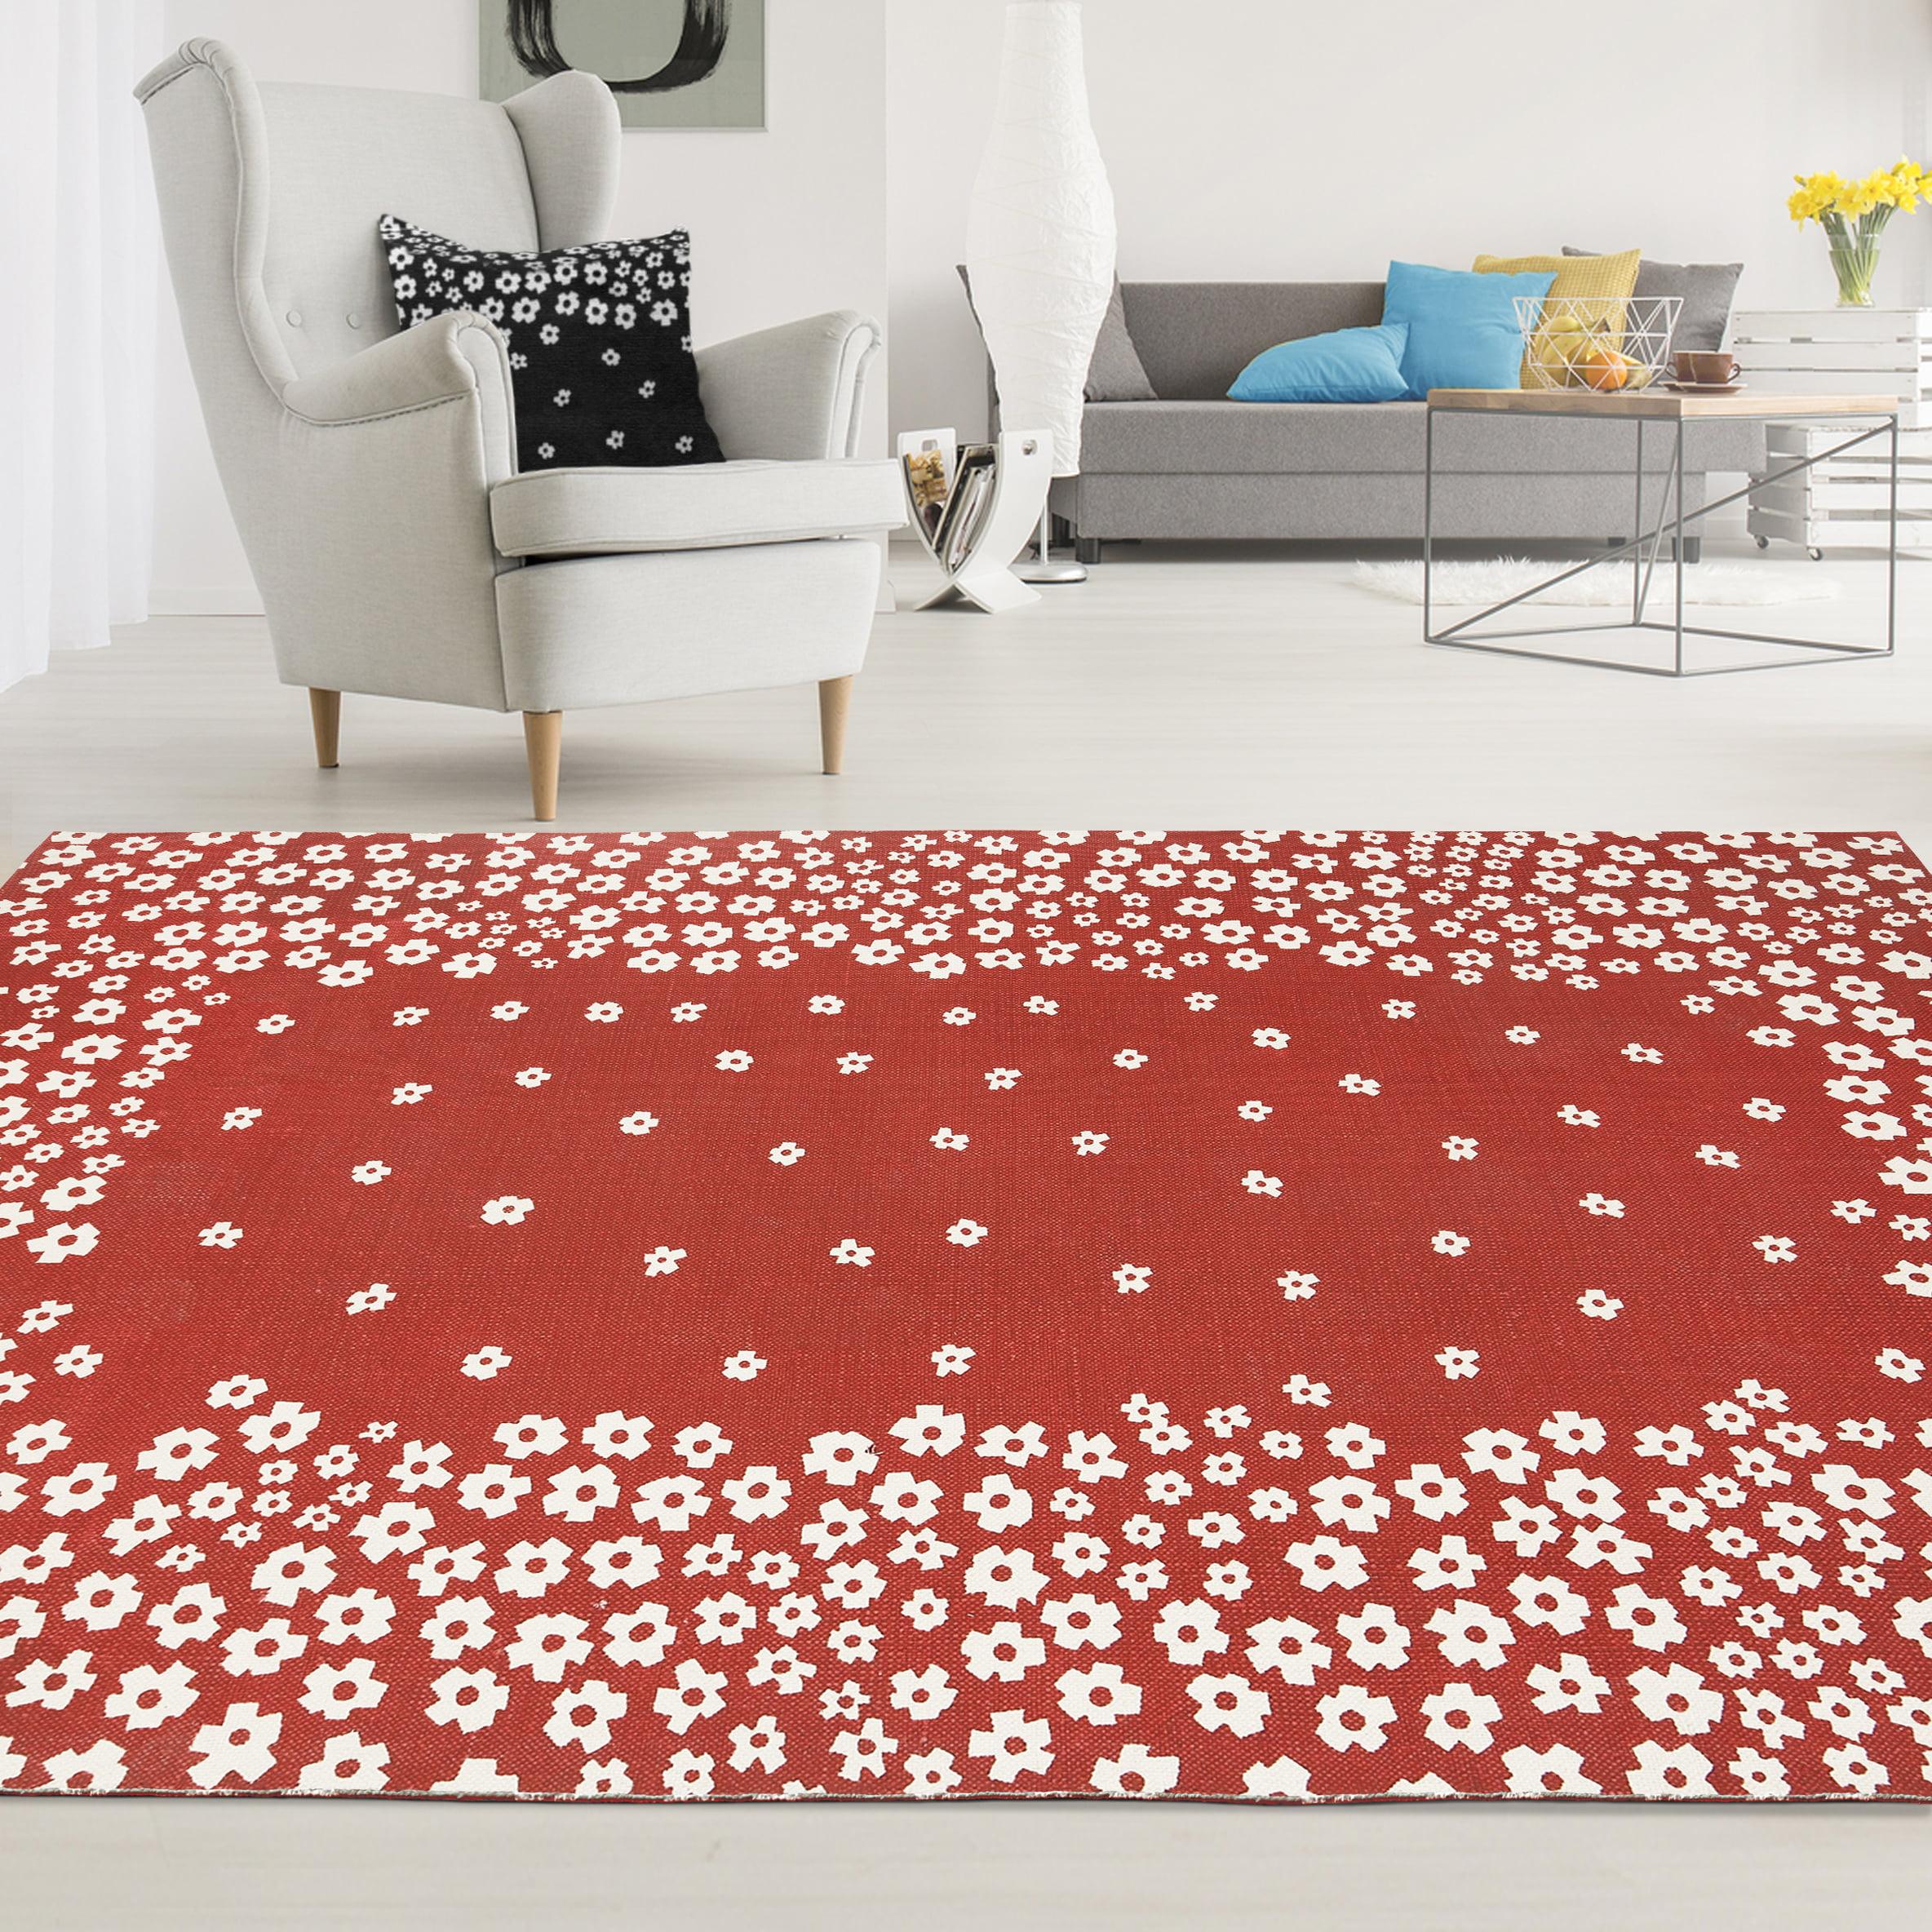 Superior Wildflower 100-Percent Cotton Printed Area Rug - Burgundy